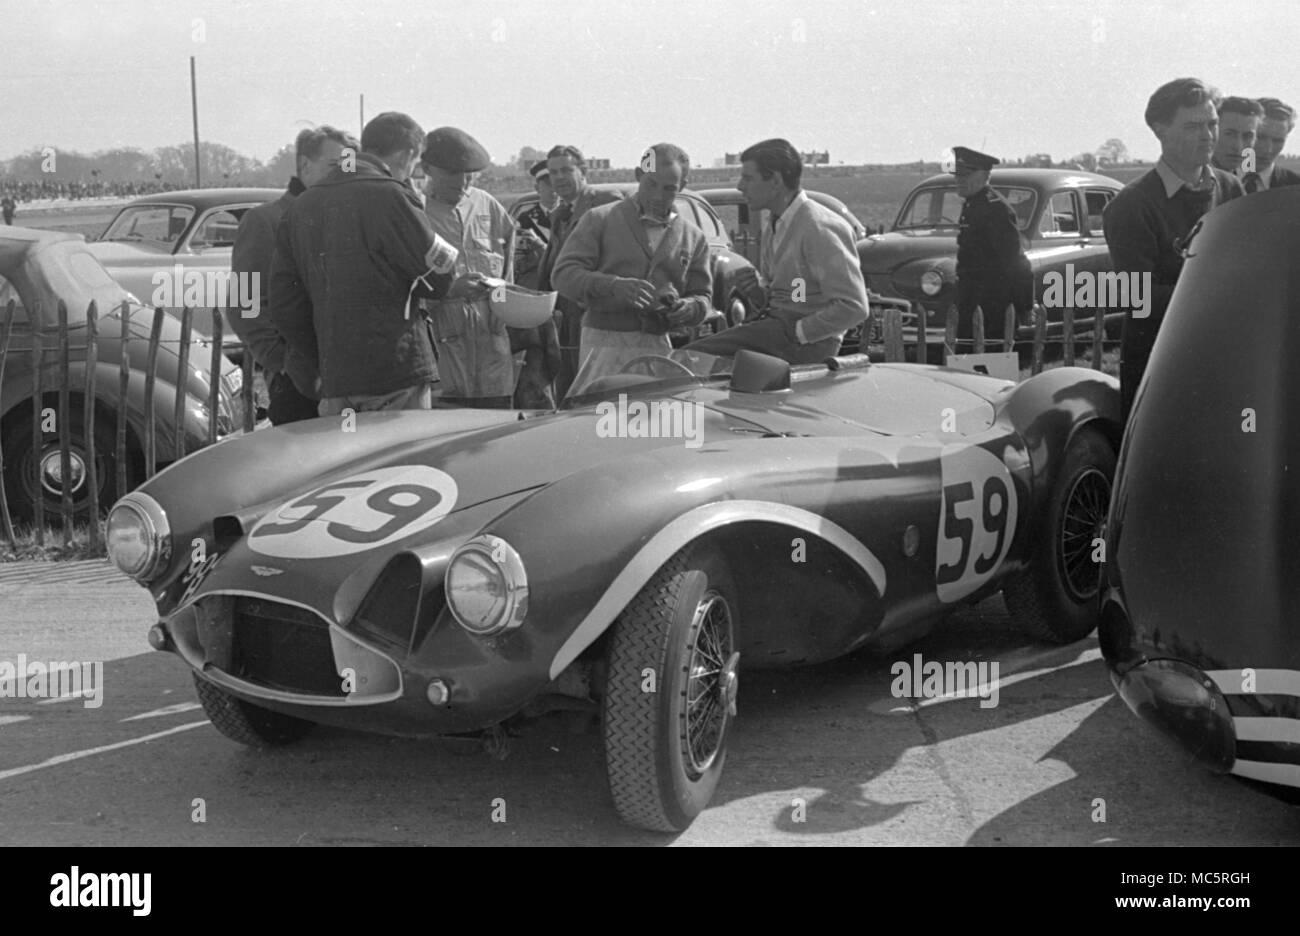 Aston Martin DB 3 S Stirling Moss, Goodwood International Sports Car Race 2.4.1956 Stockbild